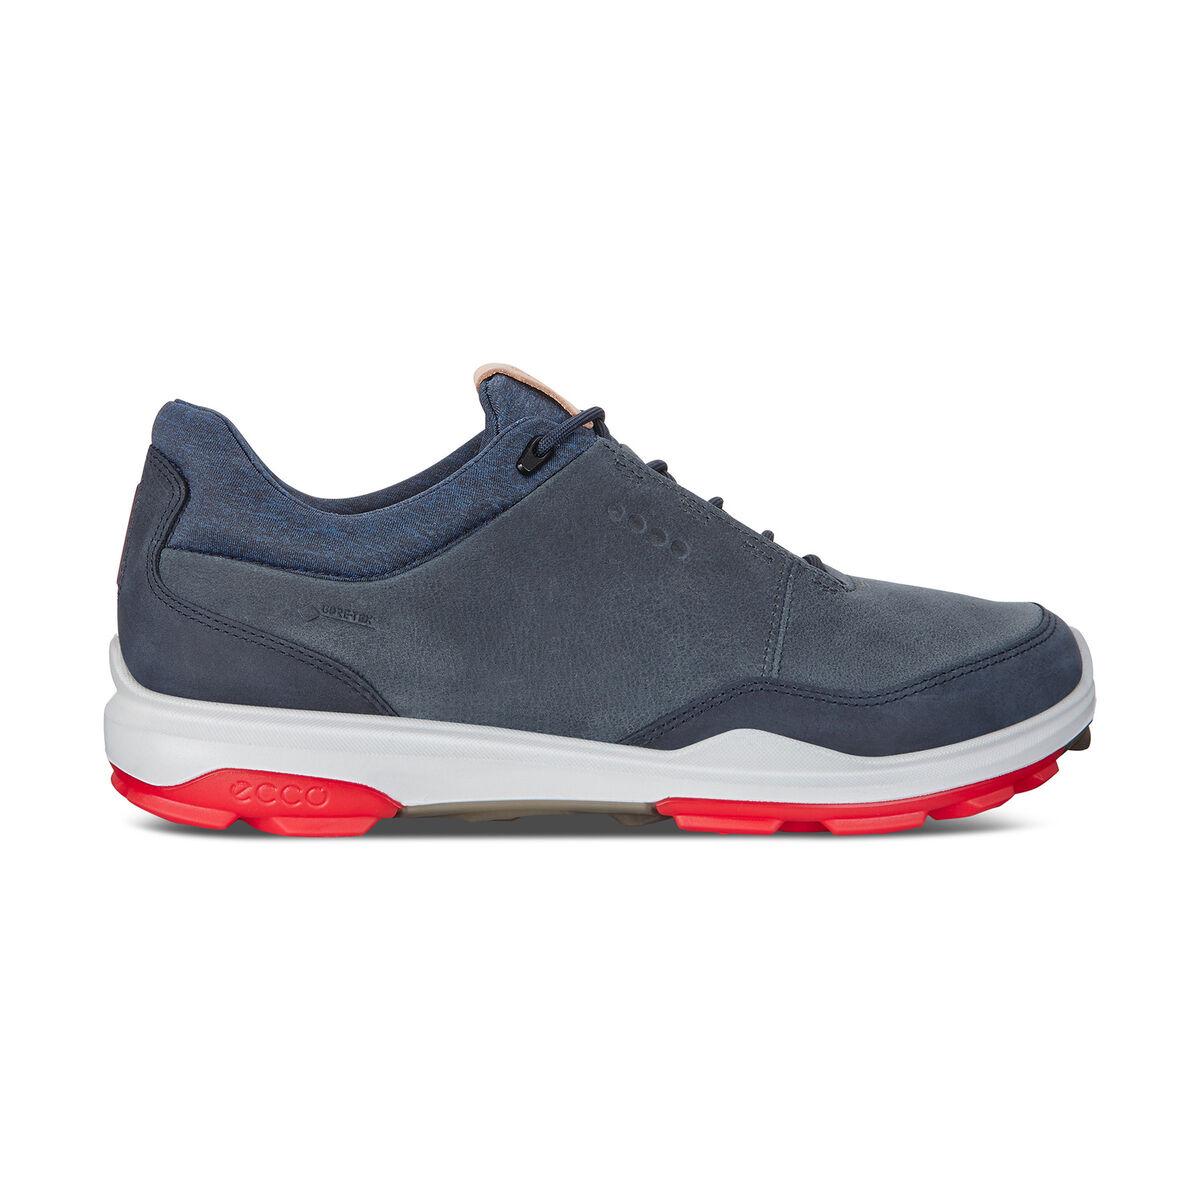 bacf8f3690 BIOM Hybrid 3 GTX Men's Golf Shoe - Navy/Red